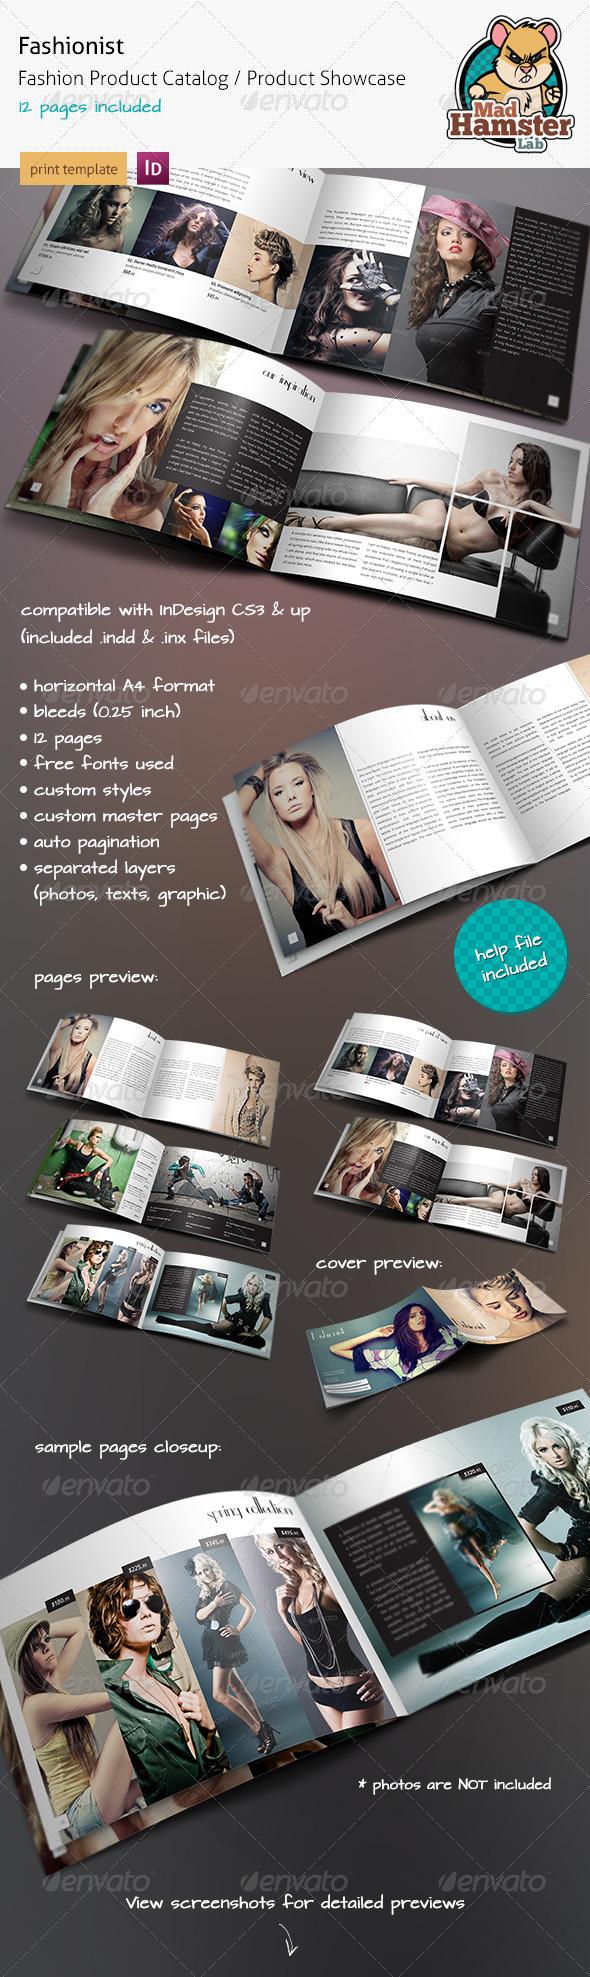 GraphicRiver Fashionist Fashion Product Catalog Showcase 2049238